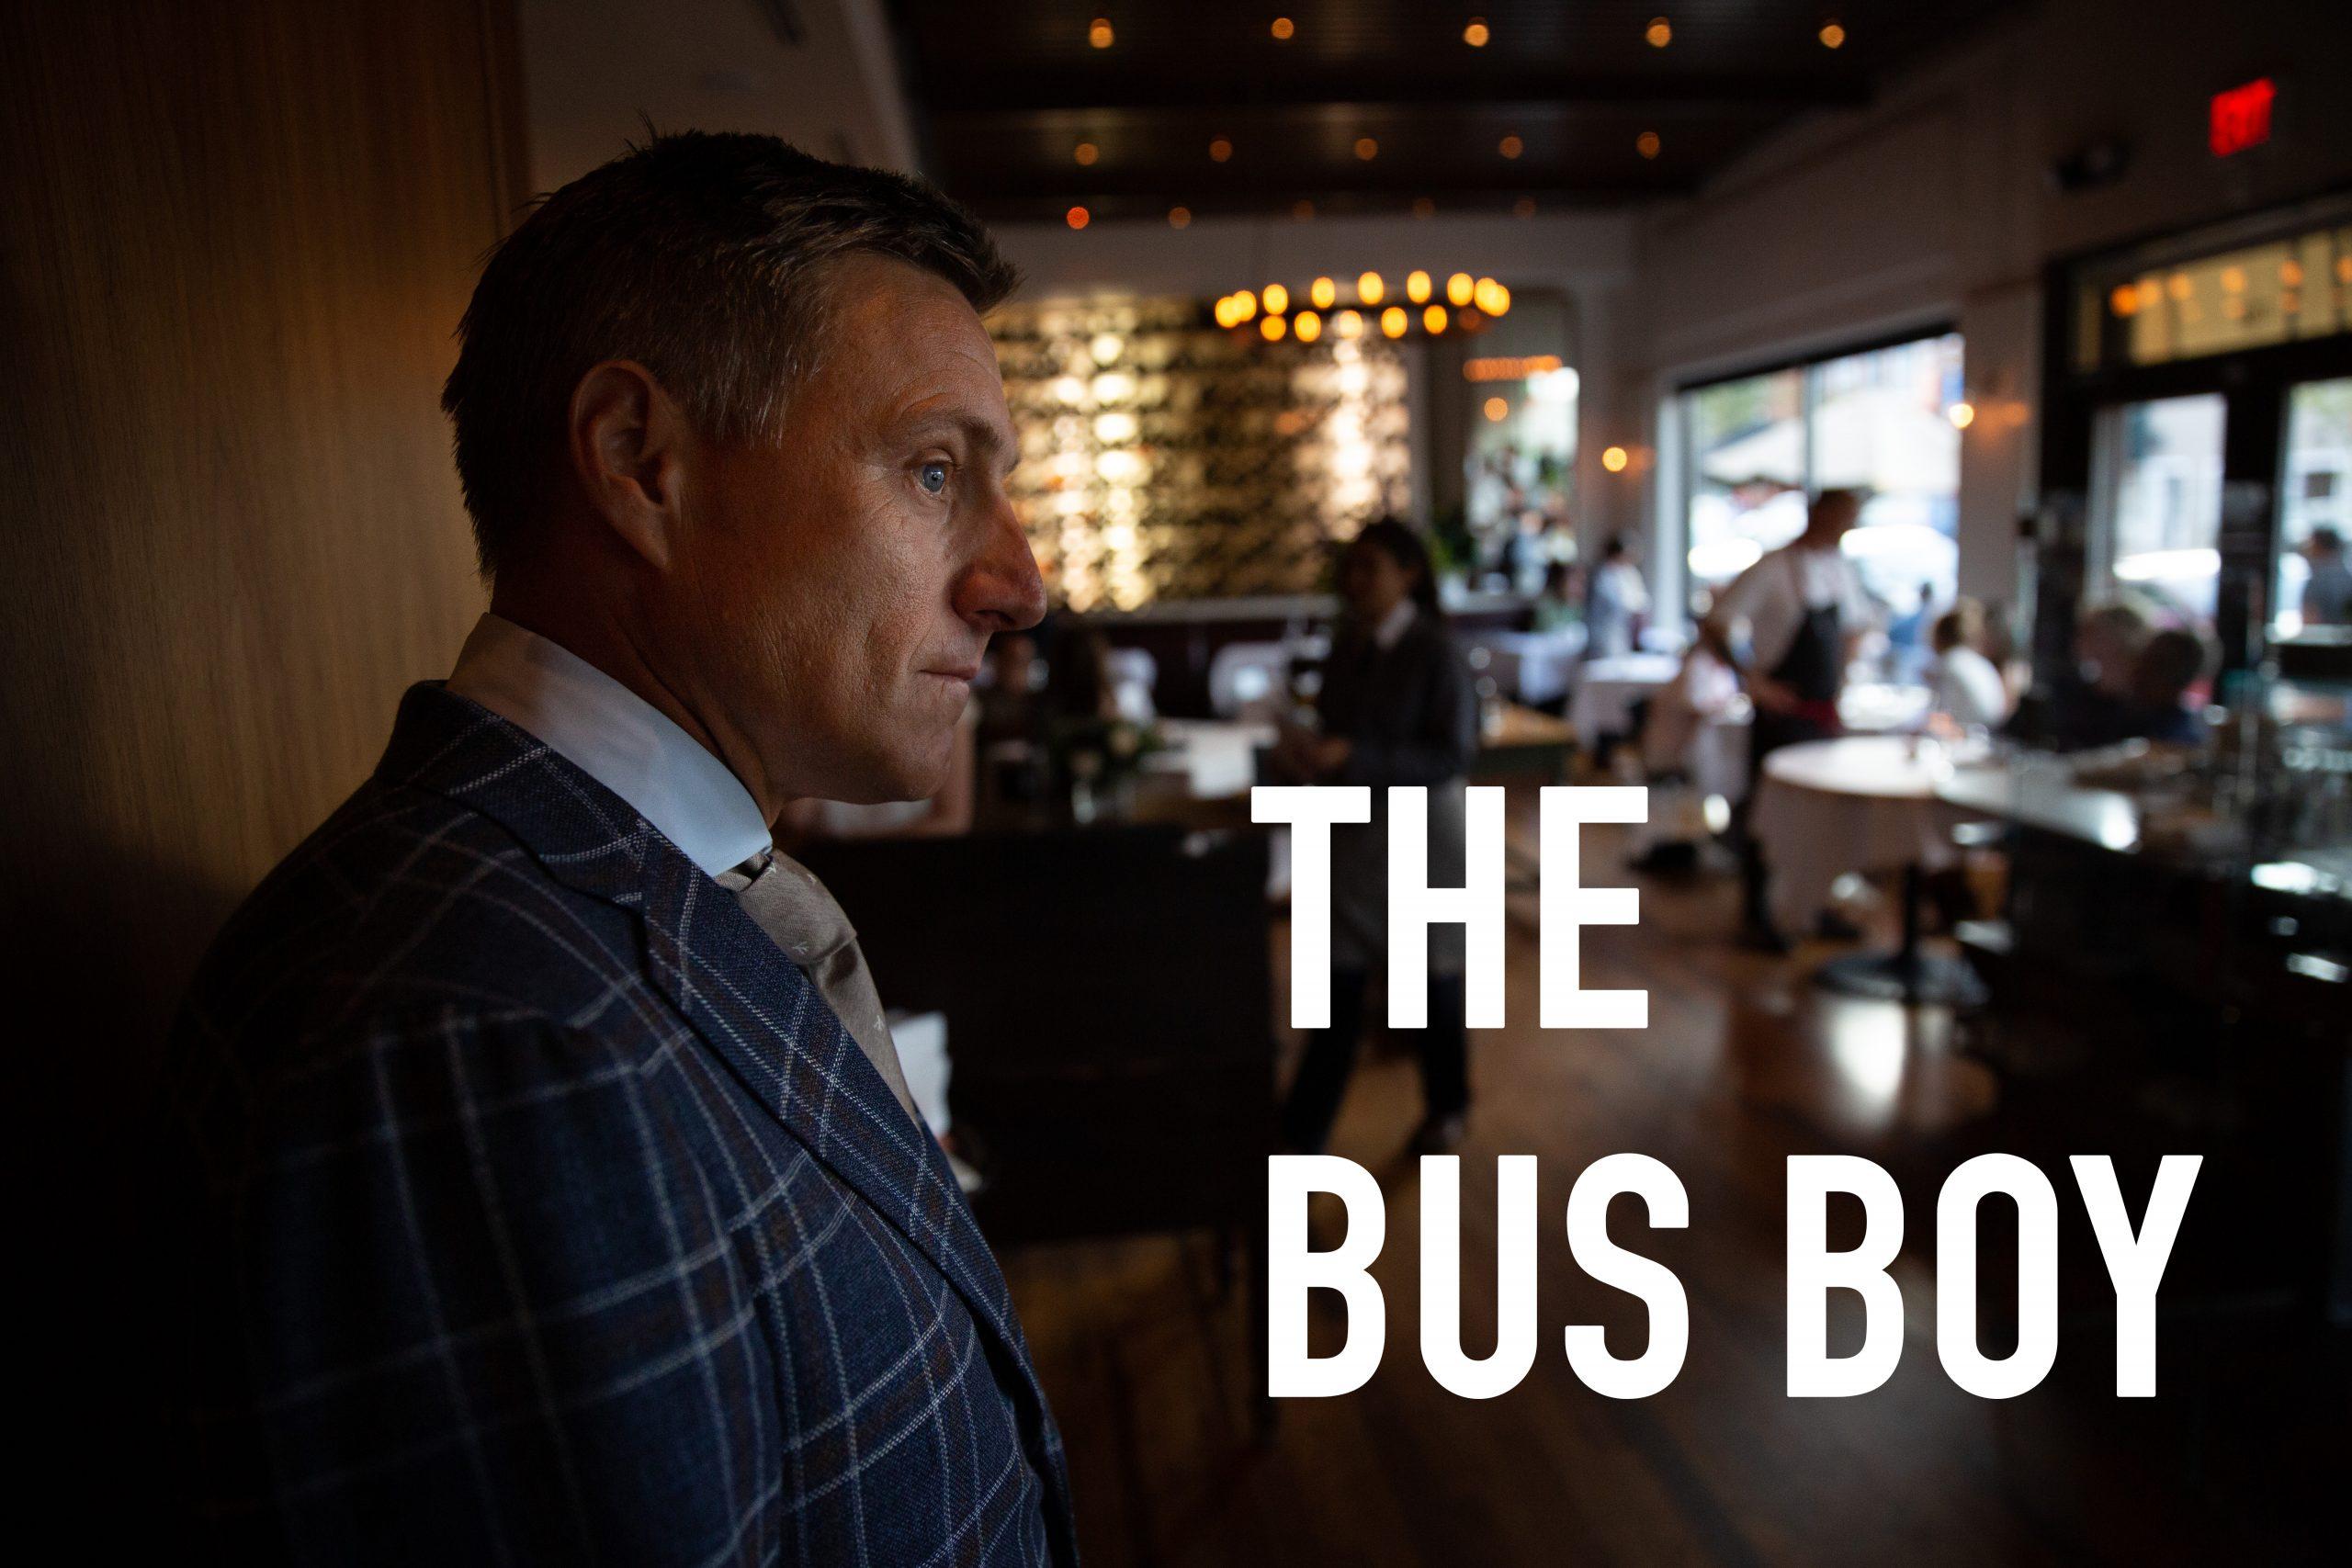 The Bus Boy (2019)